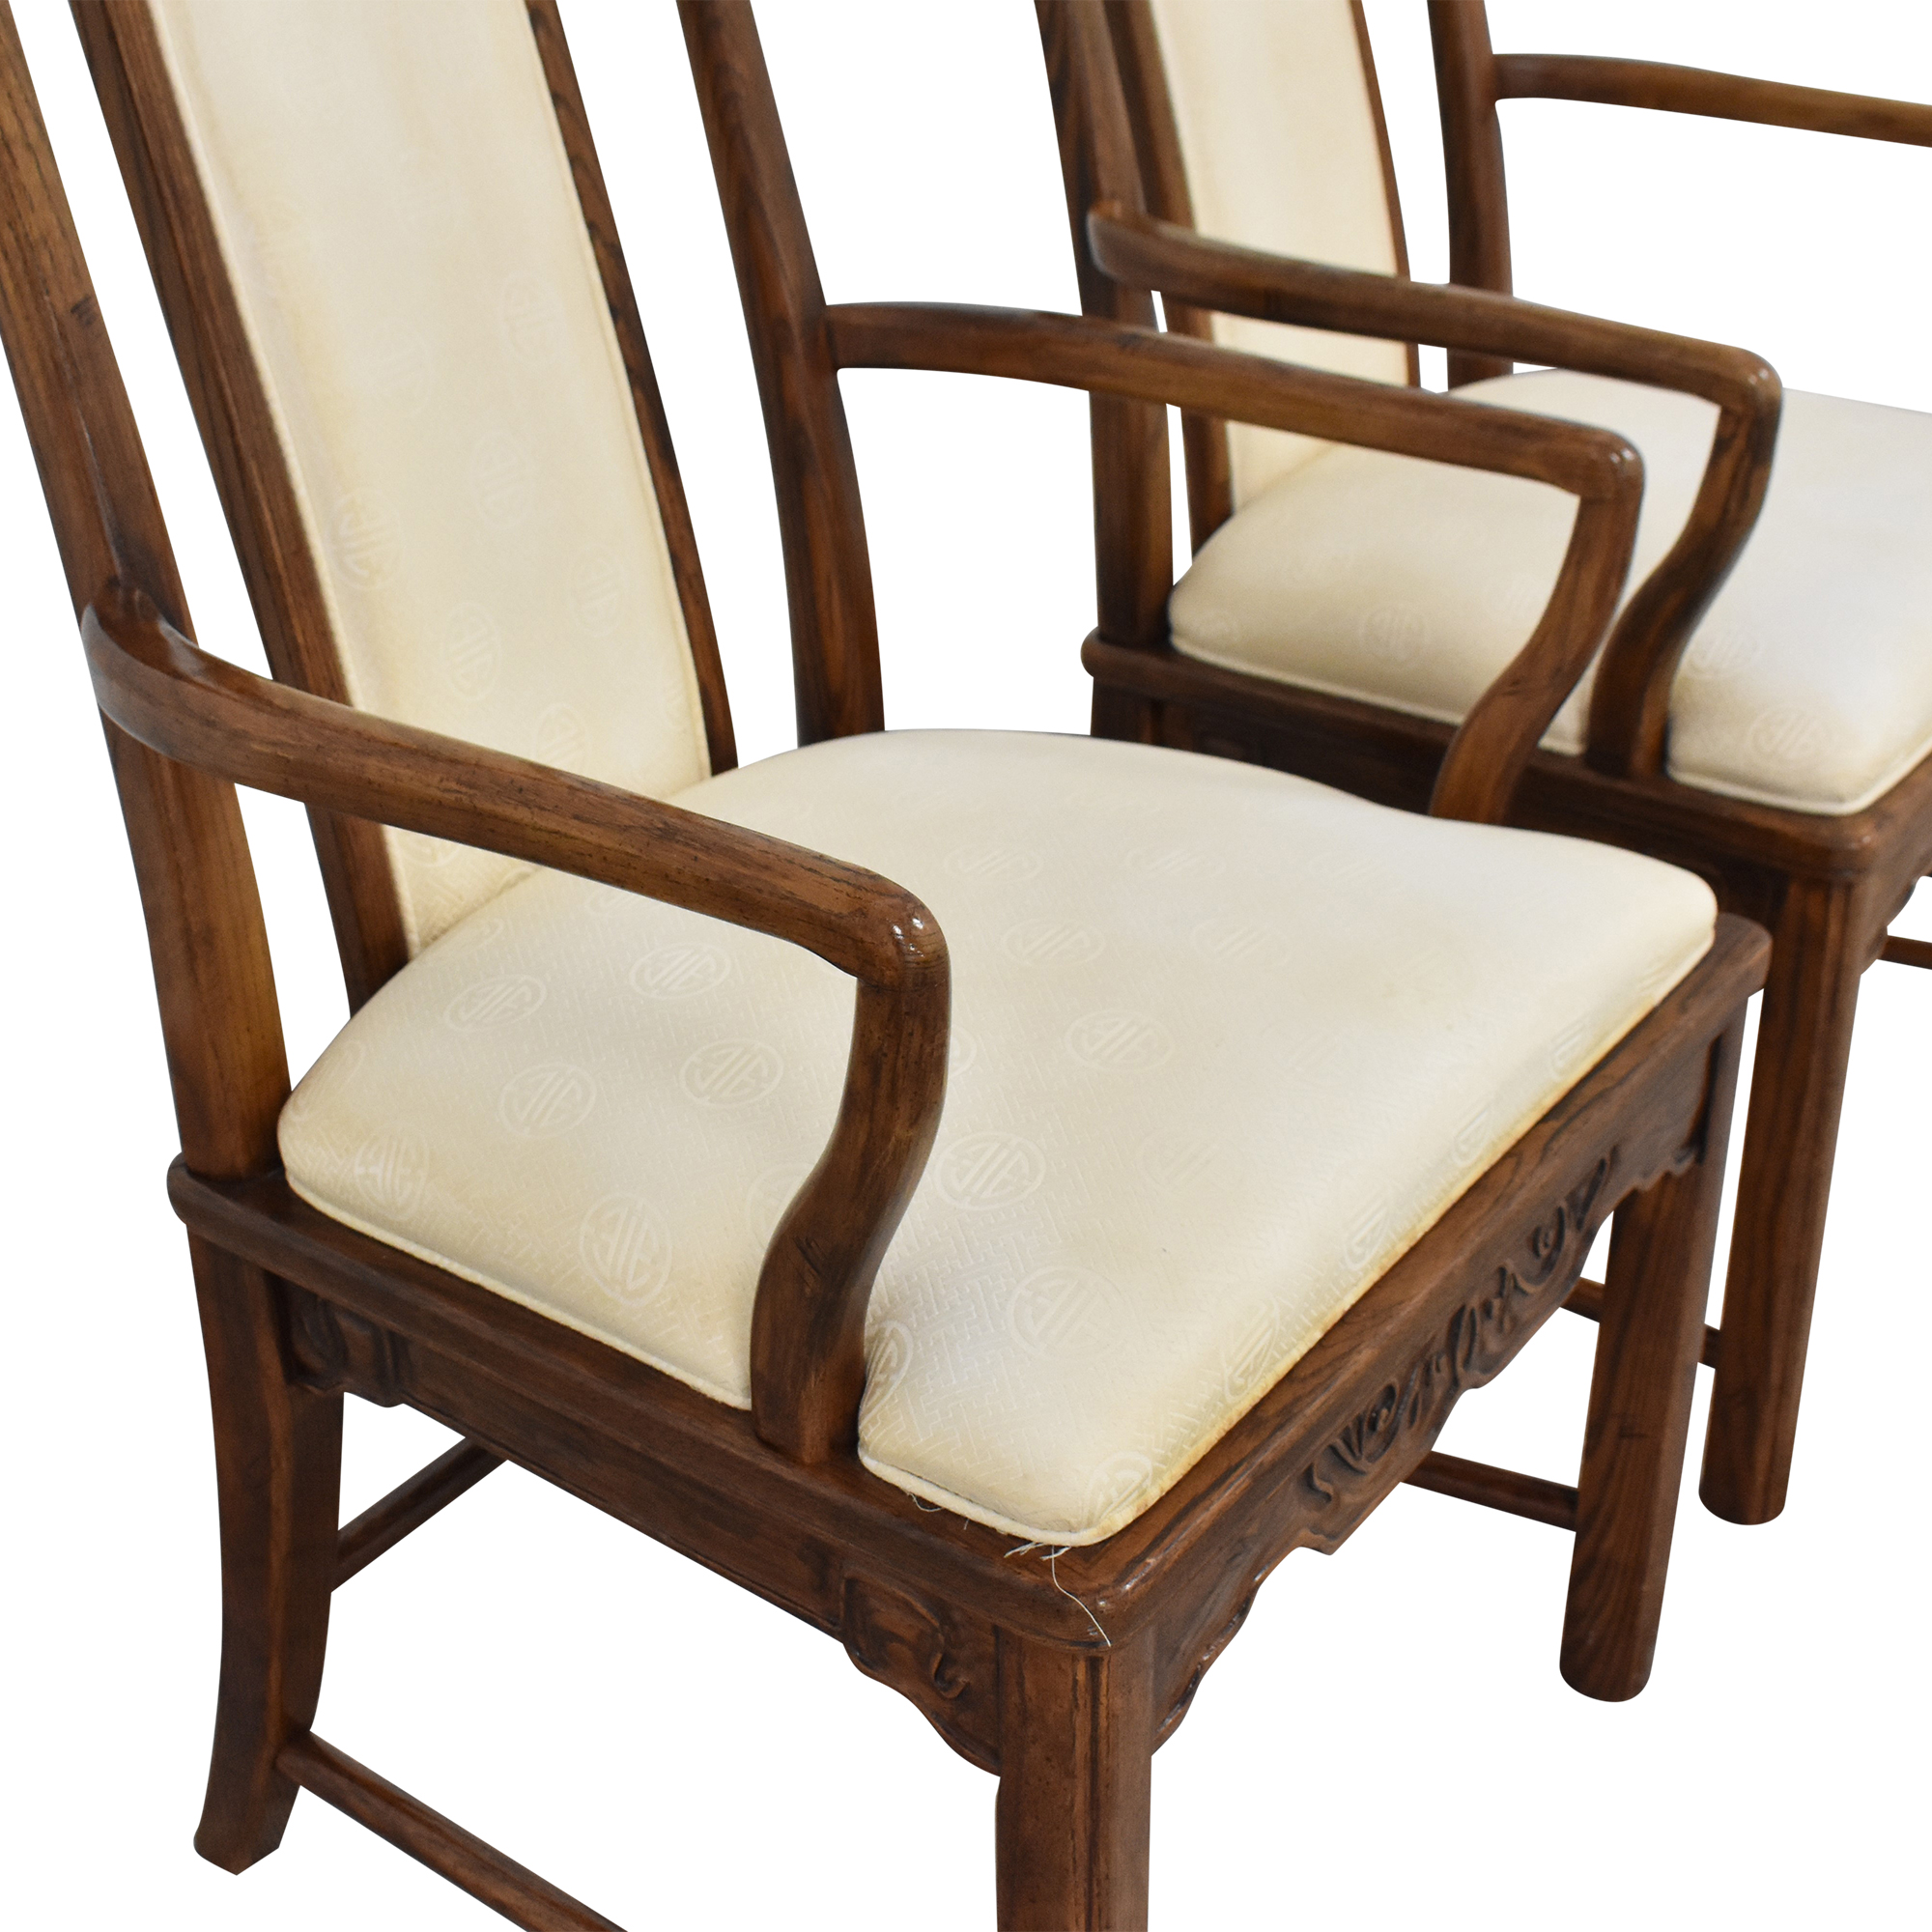 shop Unique Furniture Makers Unique Furniture Makers Dining Chairs online